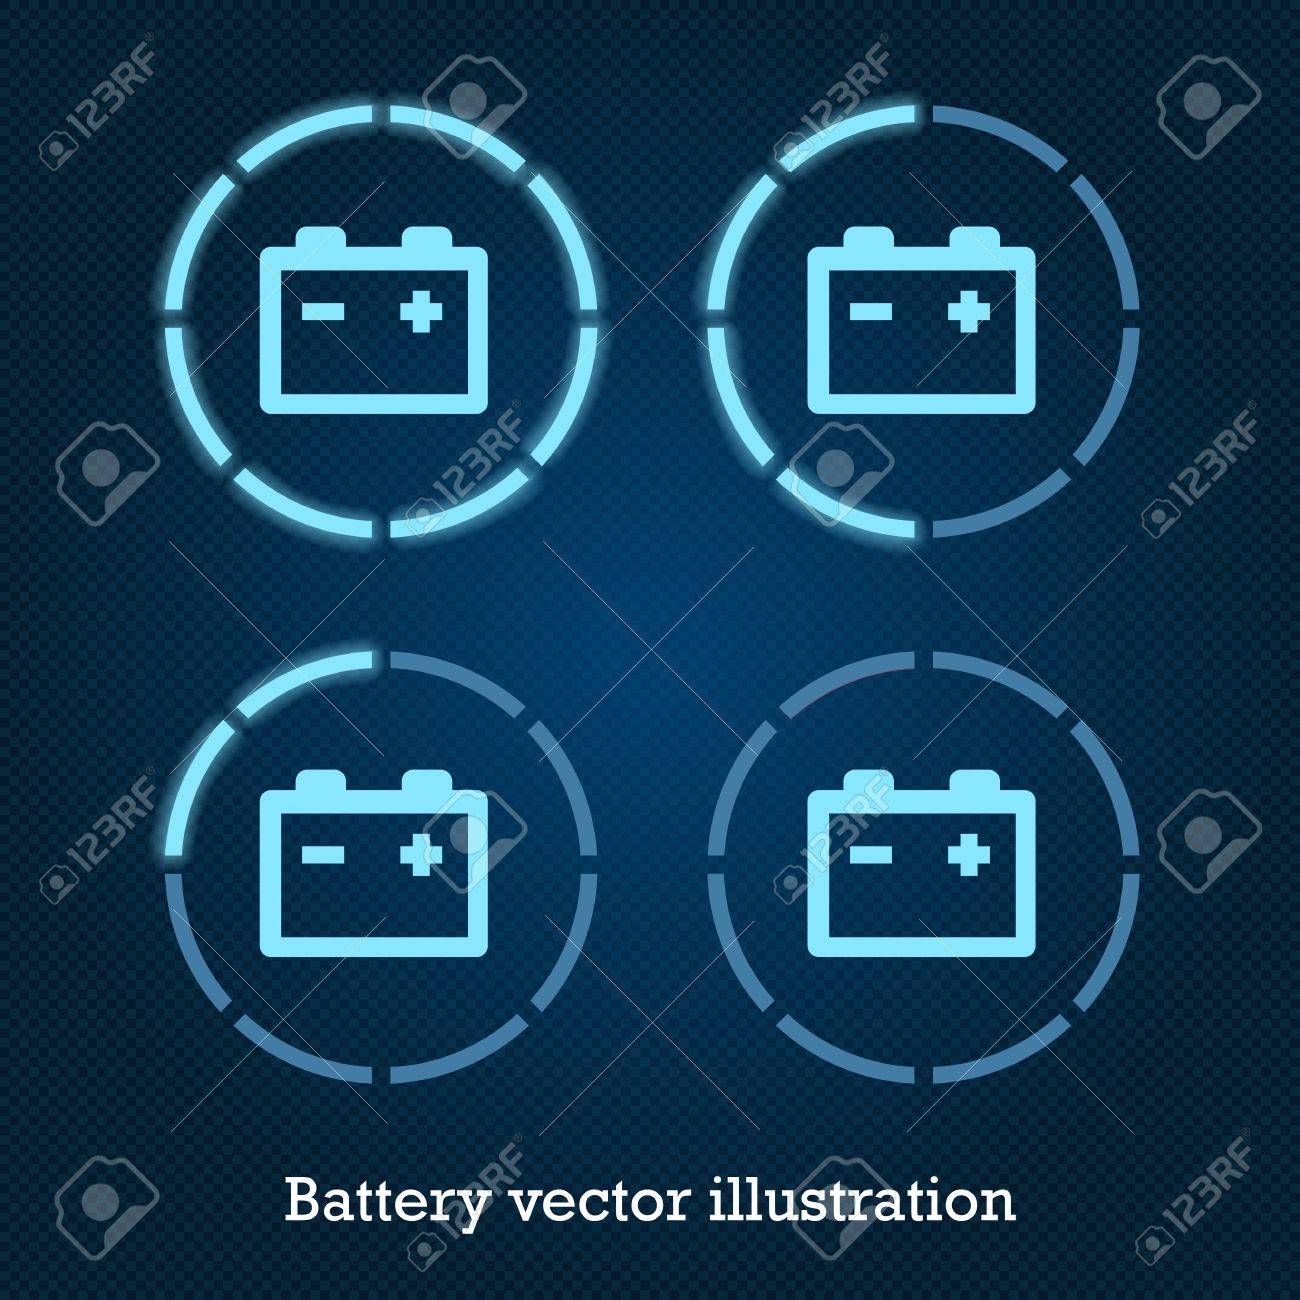 Vector car indicator icons blue battery royalty free cliparts vector car indicator icons blue battery stock vector 35960736 biocorpaavc